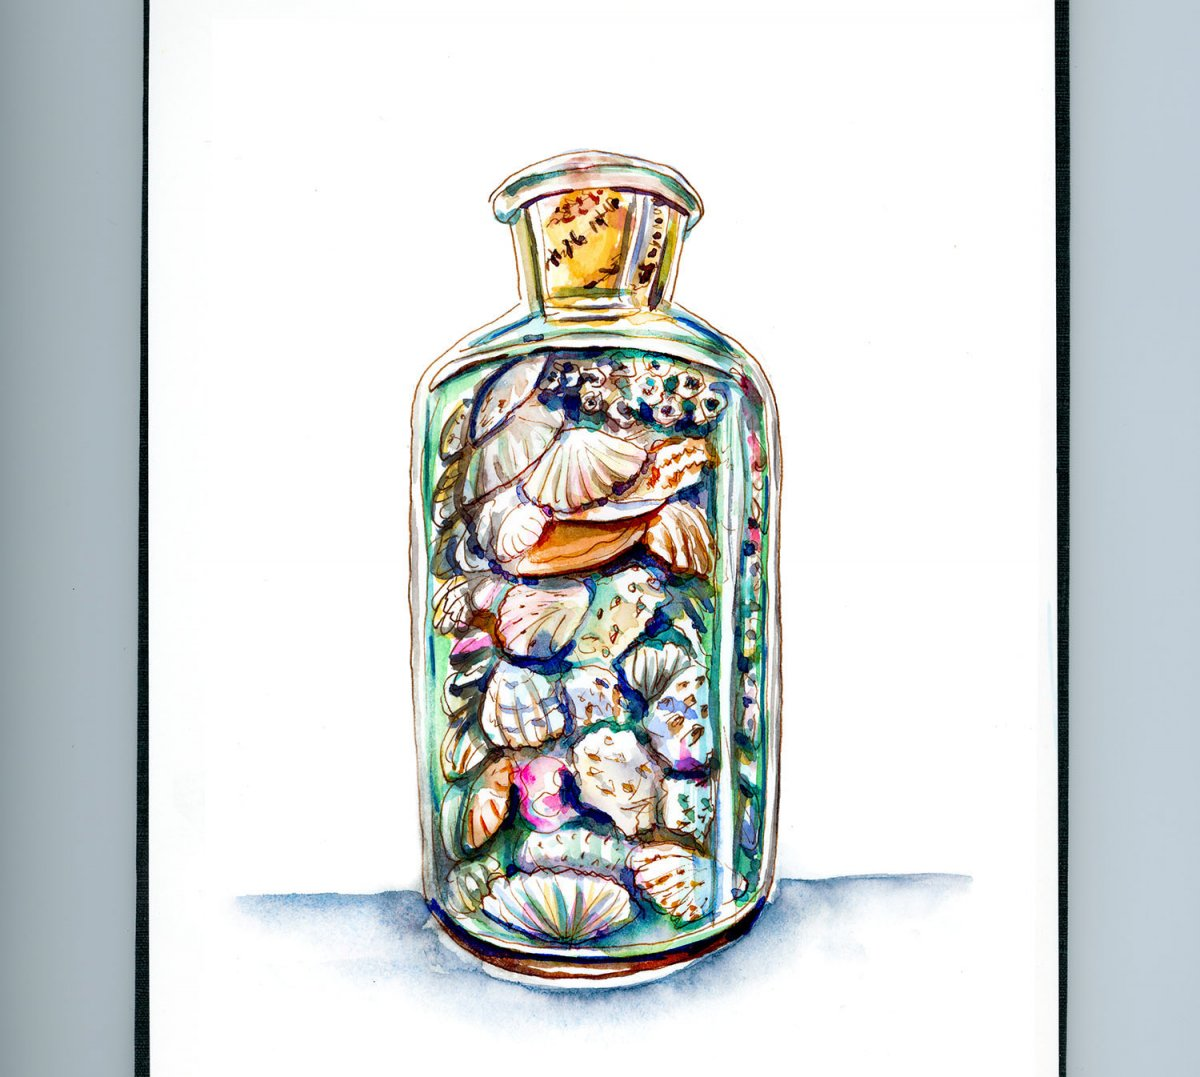 Day 6 - Seashells In A Bottle_IG - Doodlewash